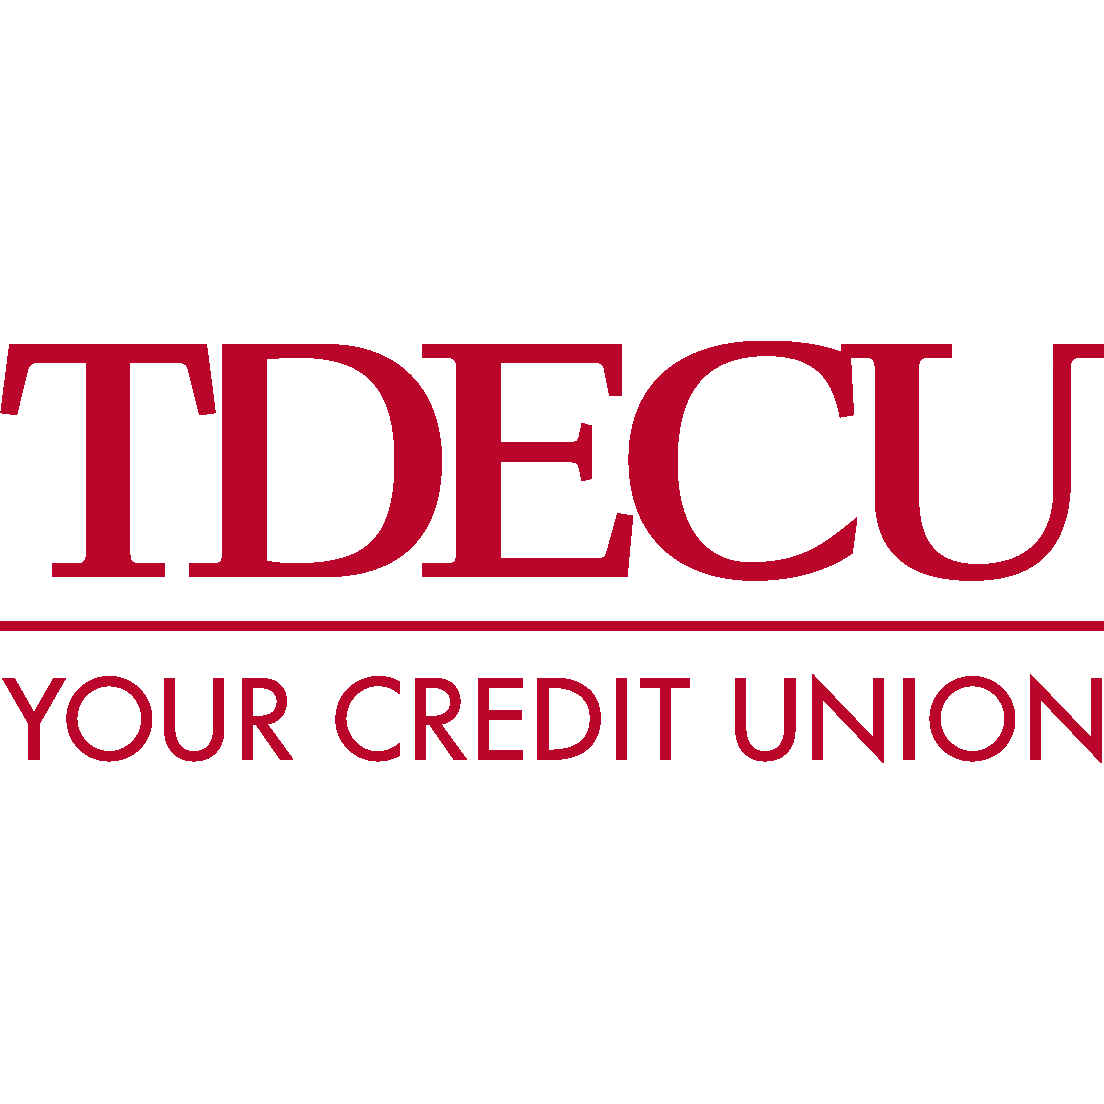 TDECU image 4